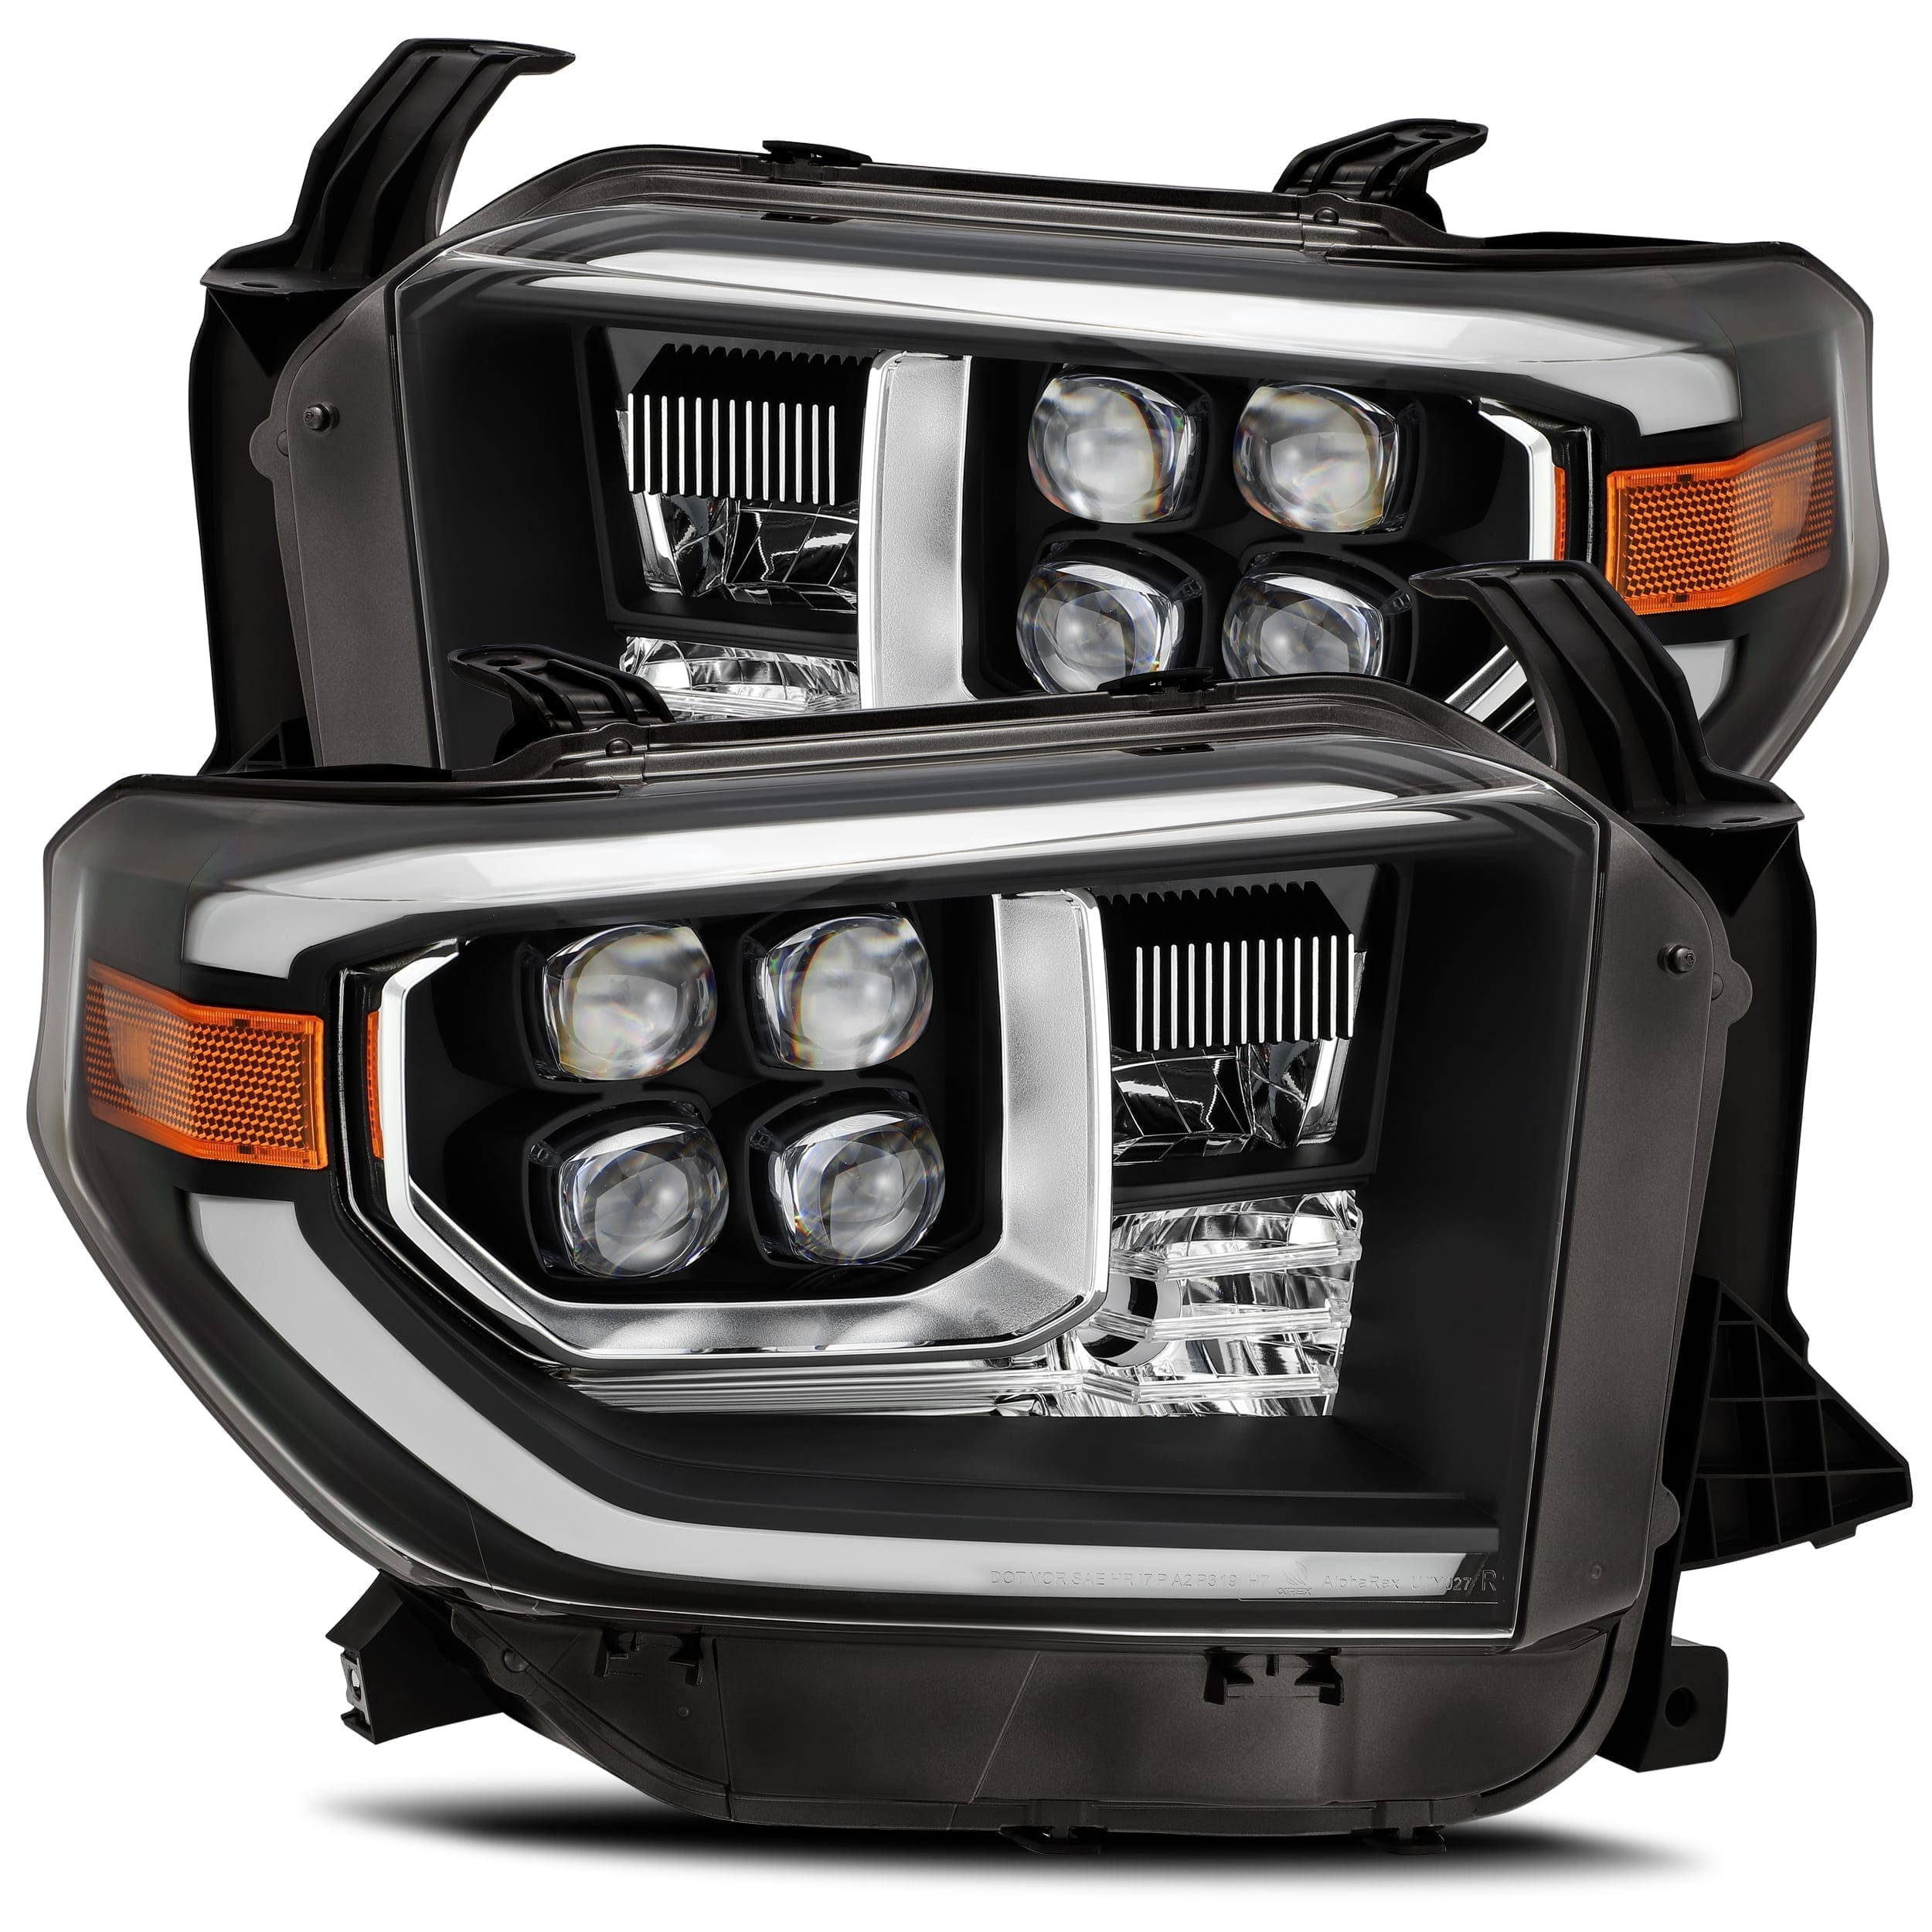 2014 2015 2016 2017 2018 2019 2020 Toyota Tundra NOVA-Series LED Projector Headlights Black